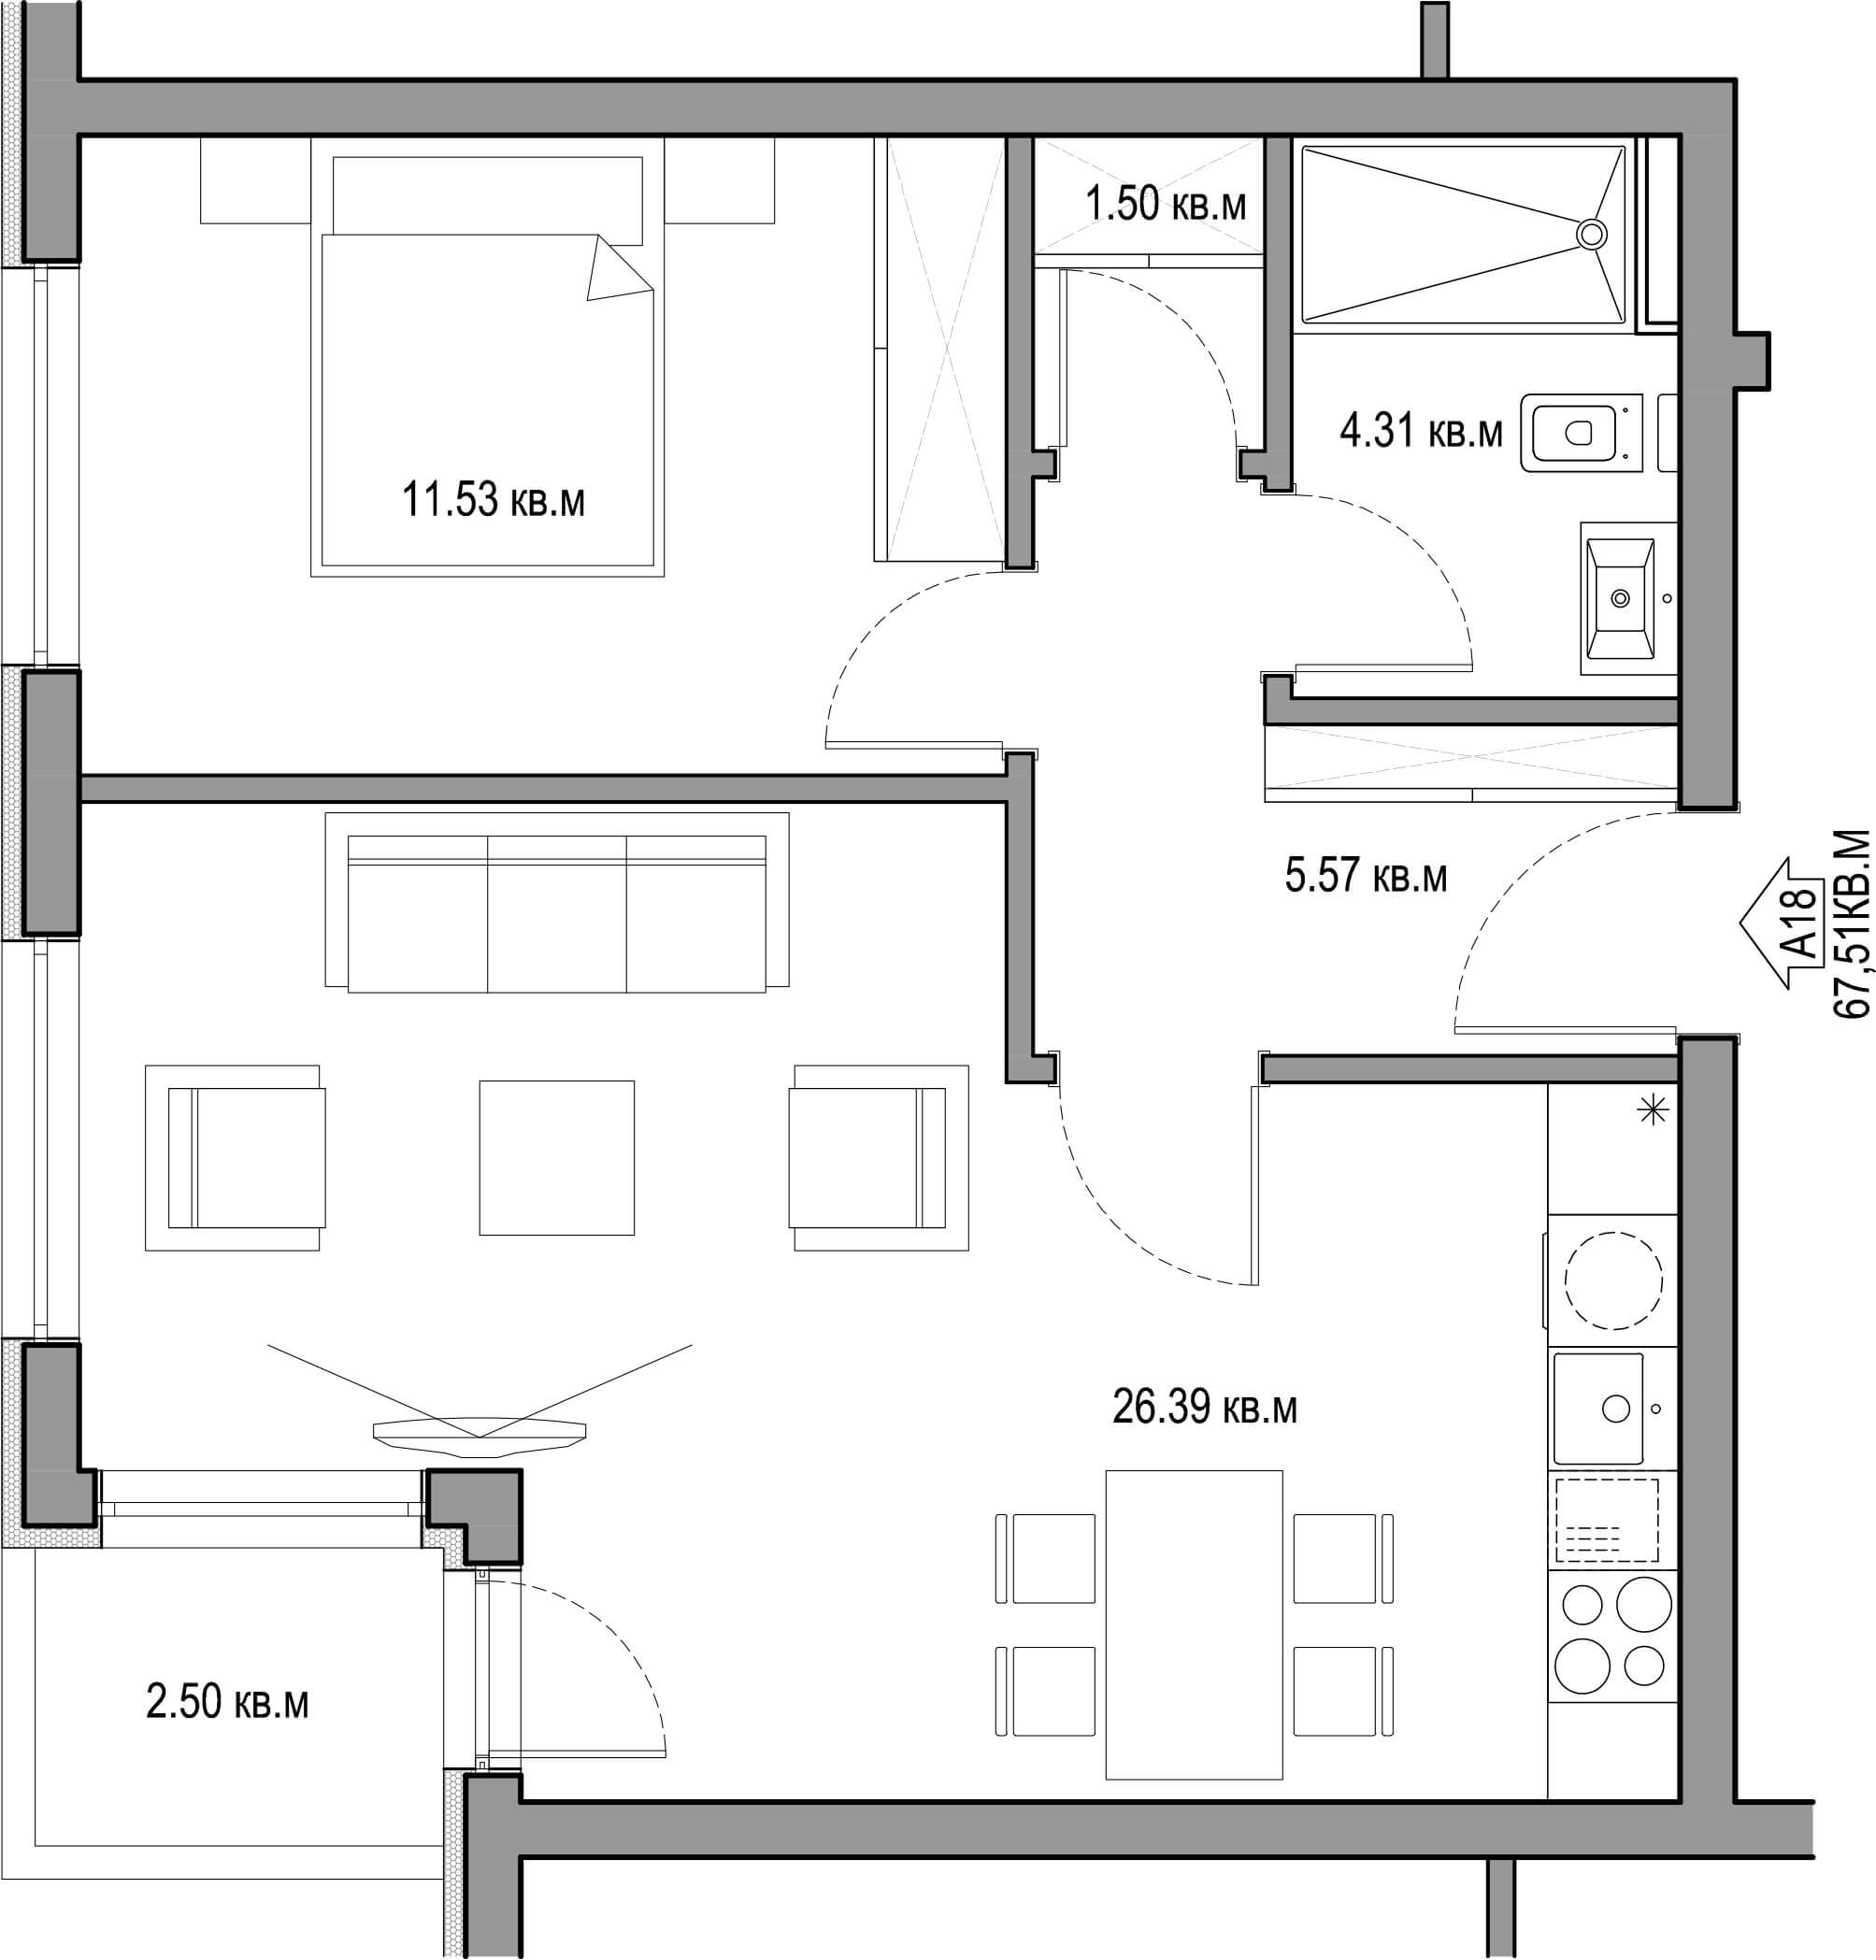 Vinitsa_Apartment_1_18